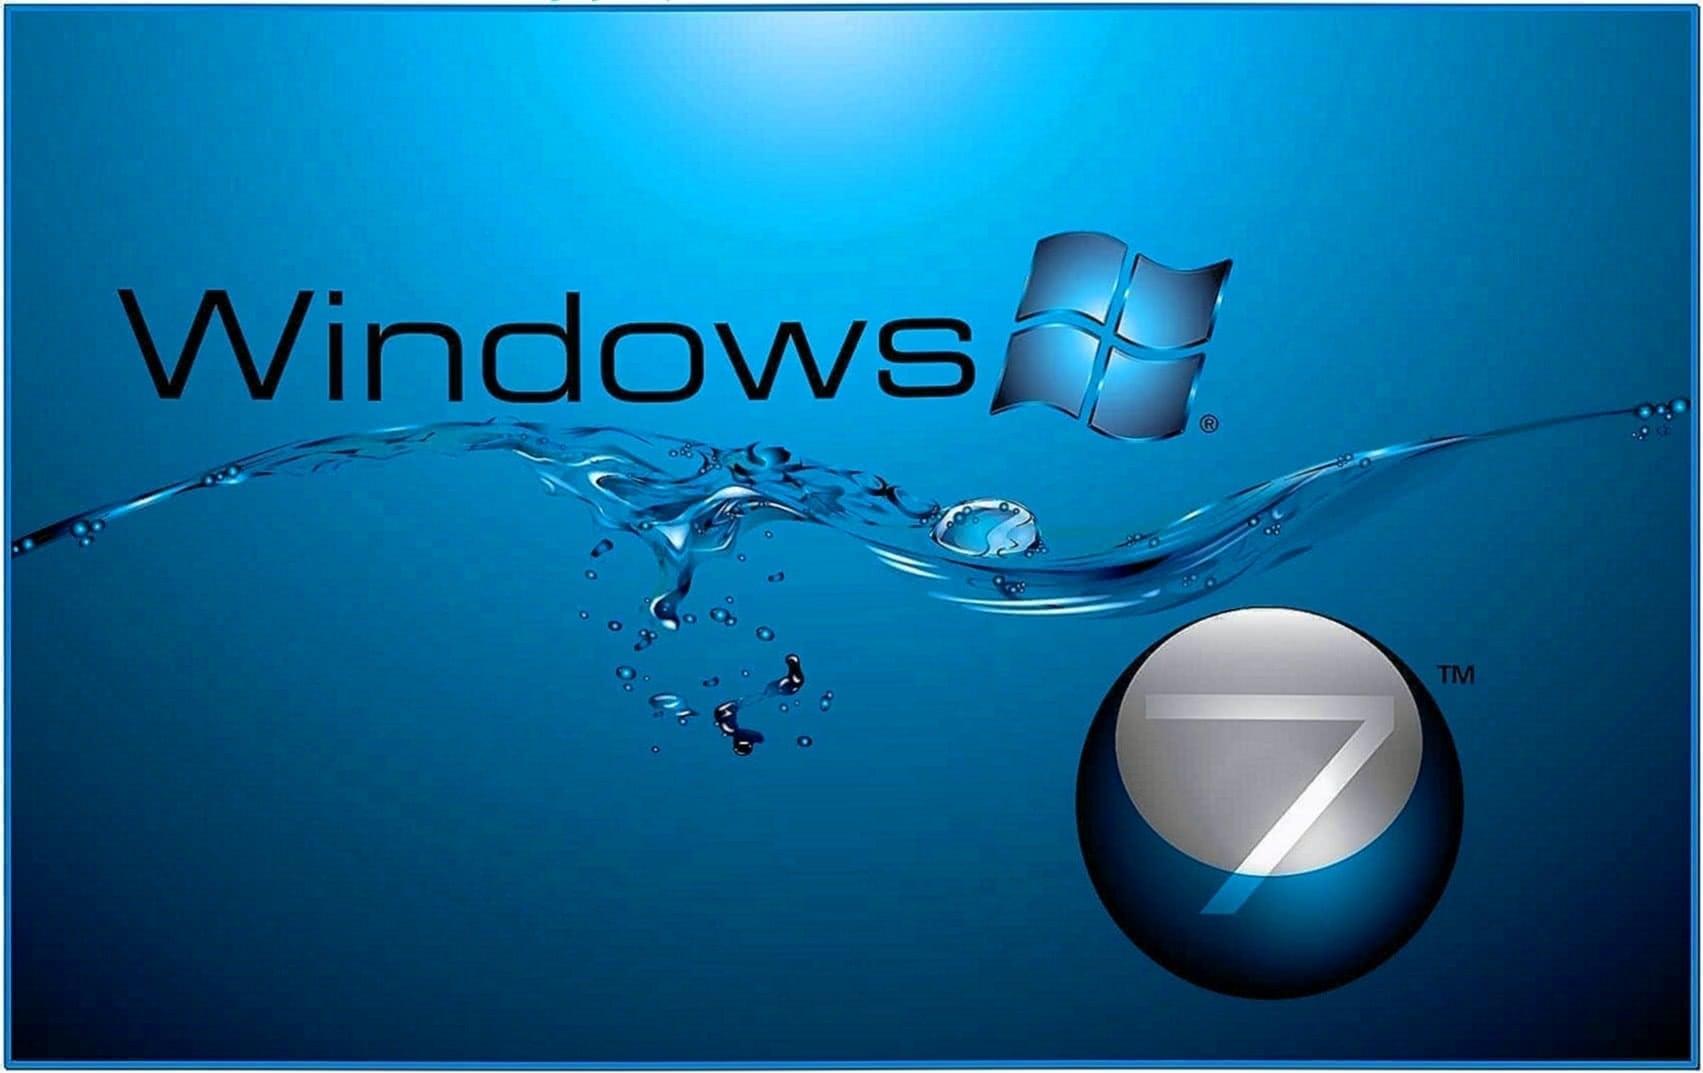 Lots of Water Screensaver Windows 7